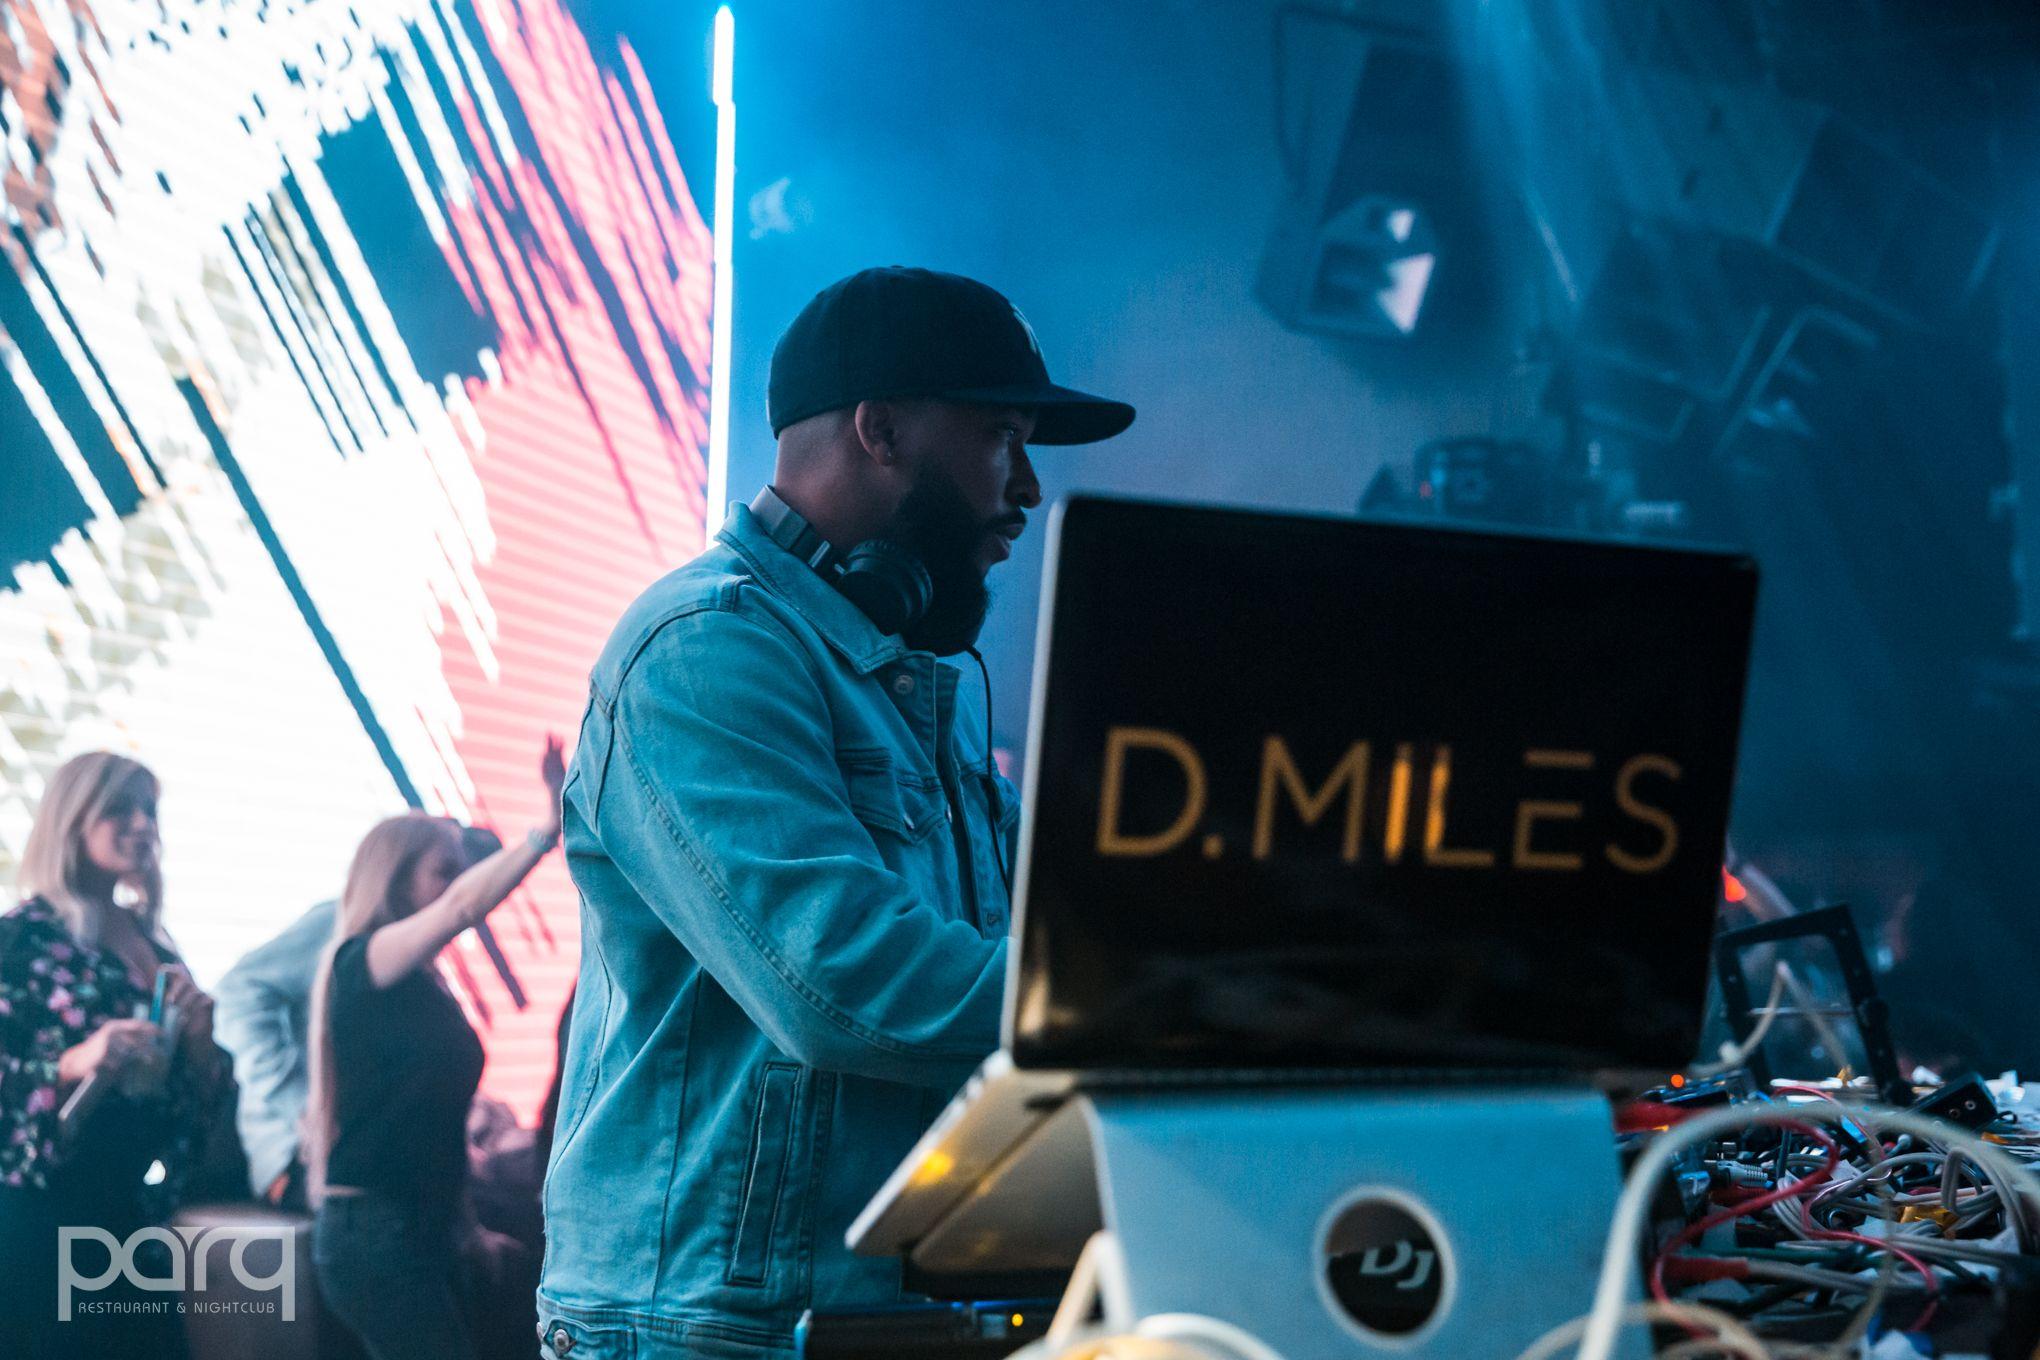 02.15.19 Parq - D Miles-5.jpg